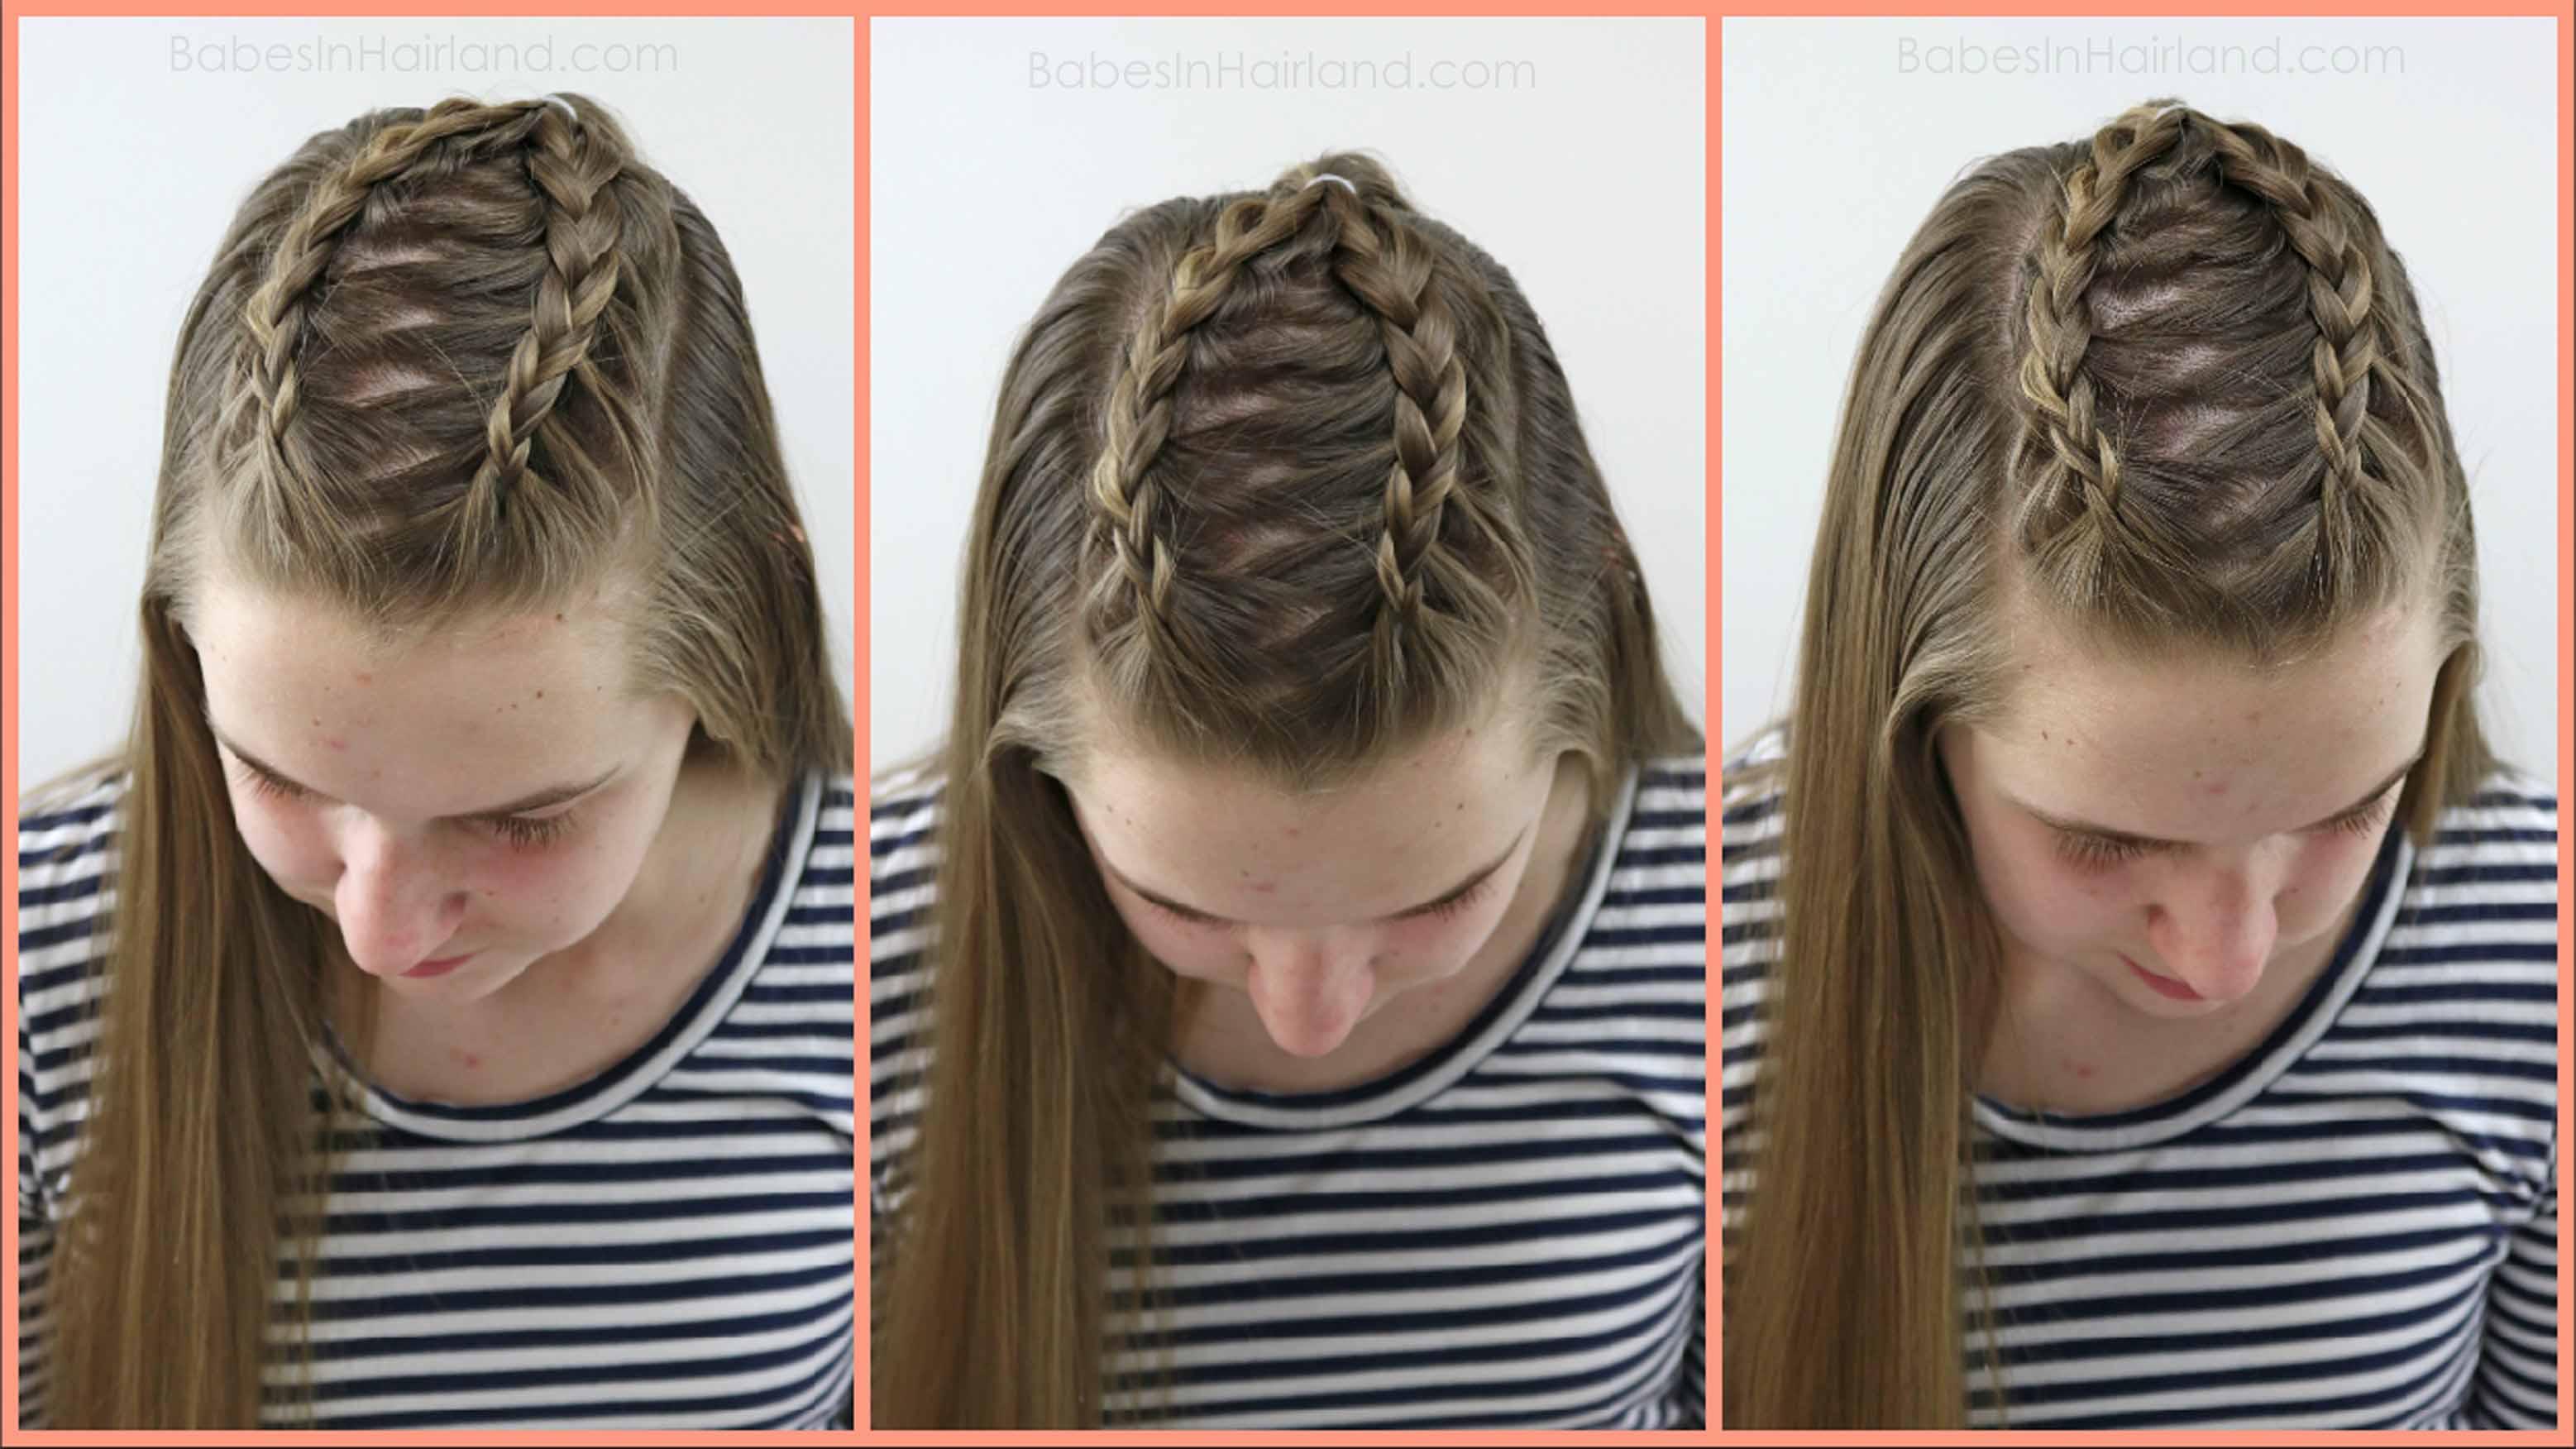 2 Dutch Braids 5 Different Hairstyles Babesinhairland Com